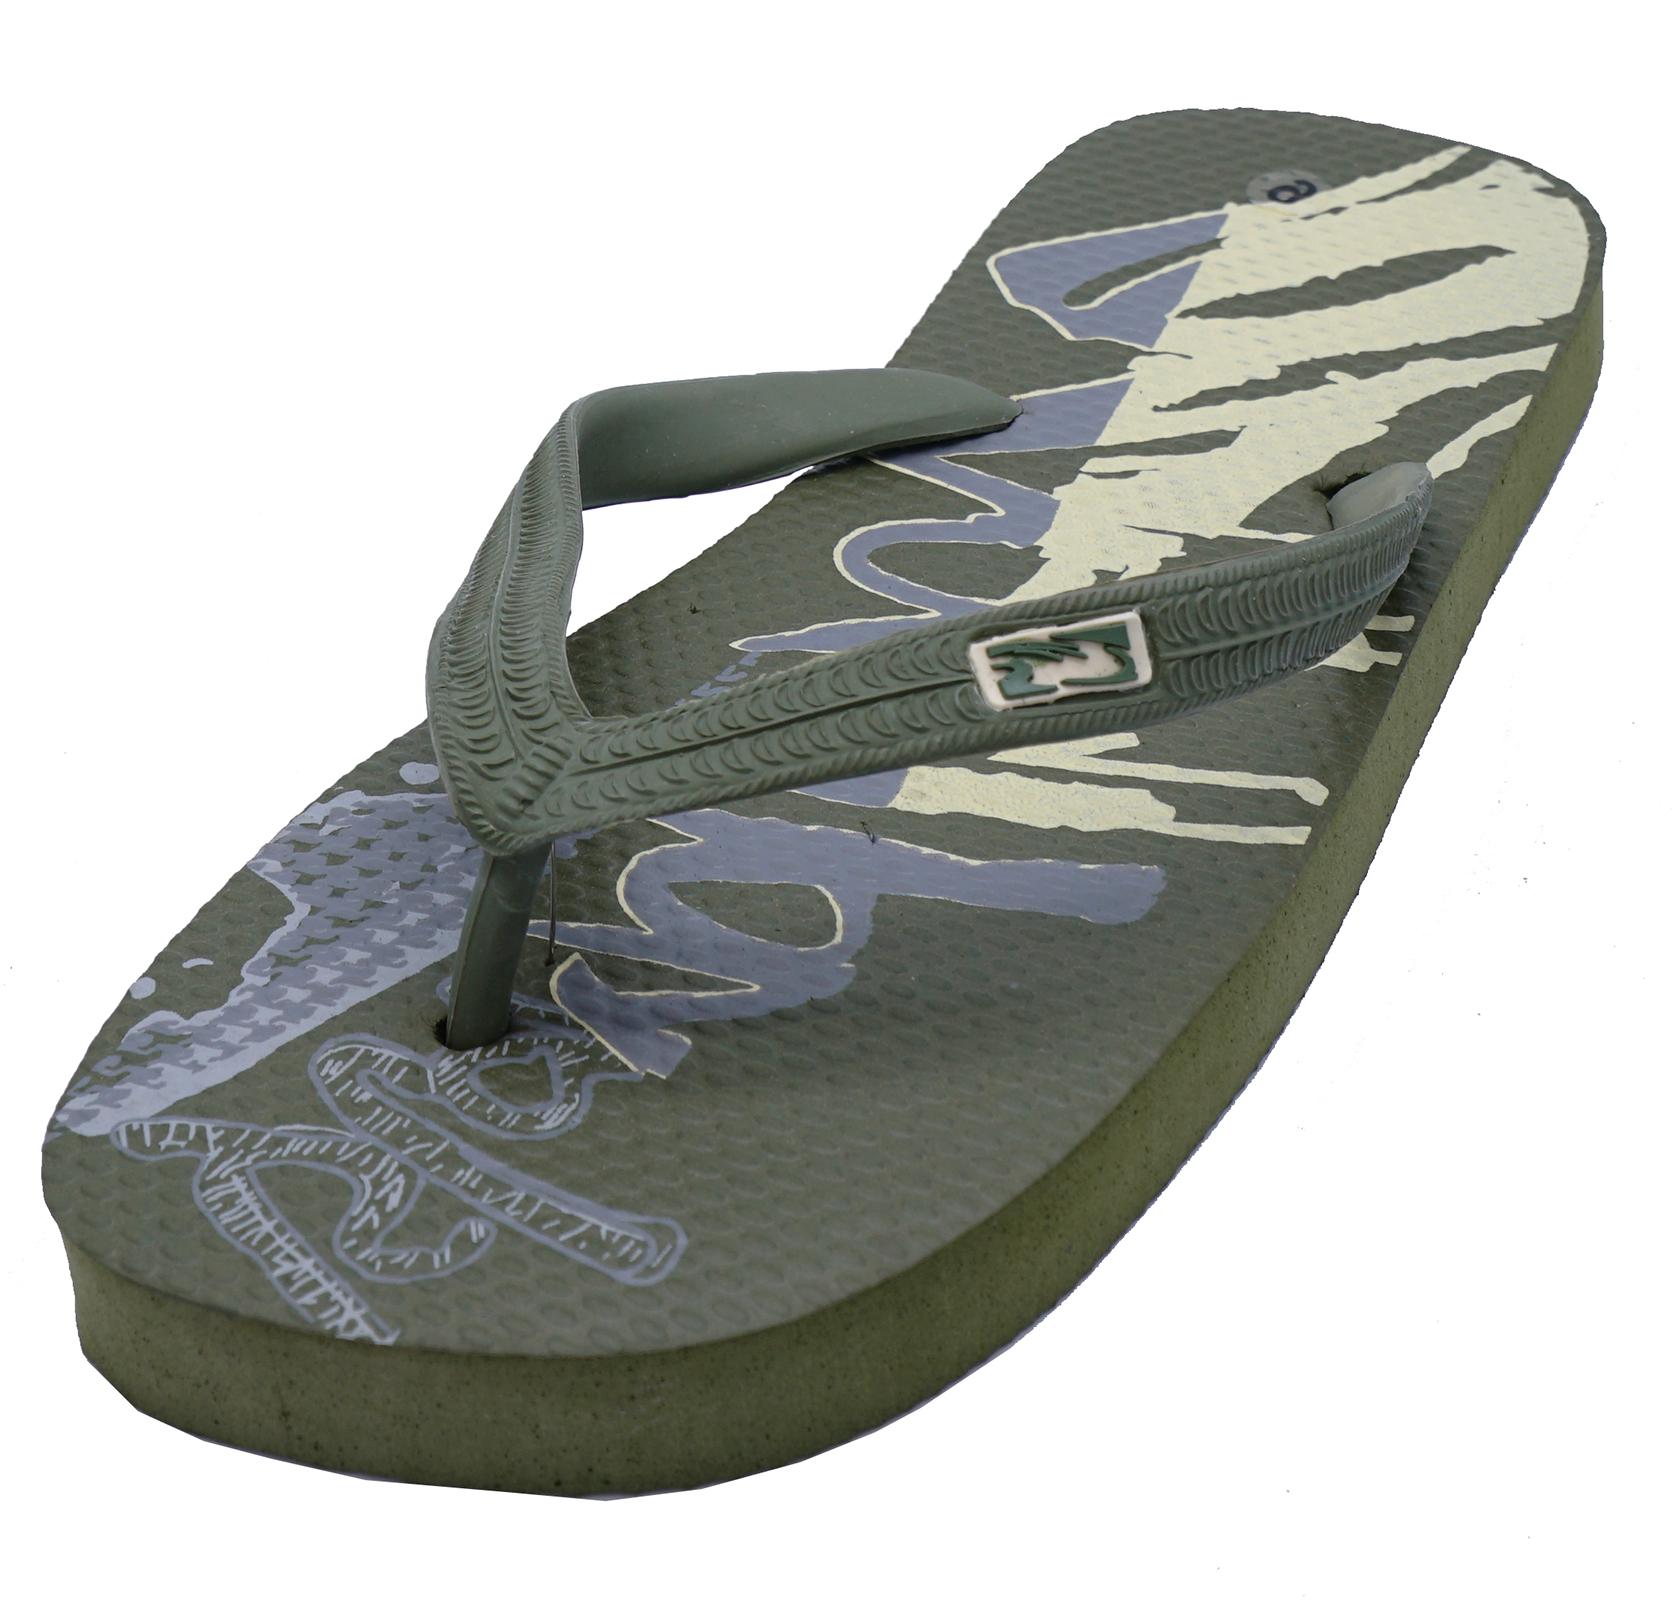 MENS KHAKI TOE-POST SUMMER FLIP-FLOP HOLIDAY BEACH SANDALS POOL SHOES SIZES 7-12